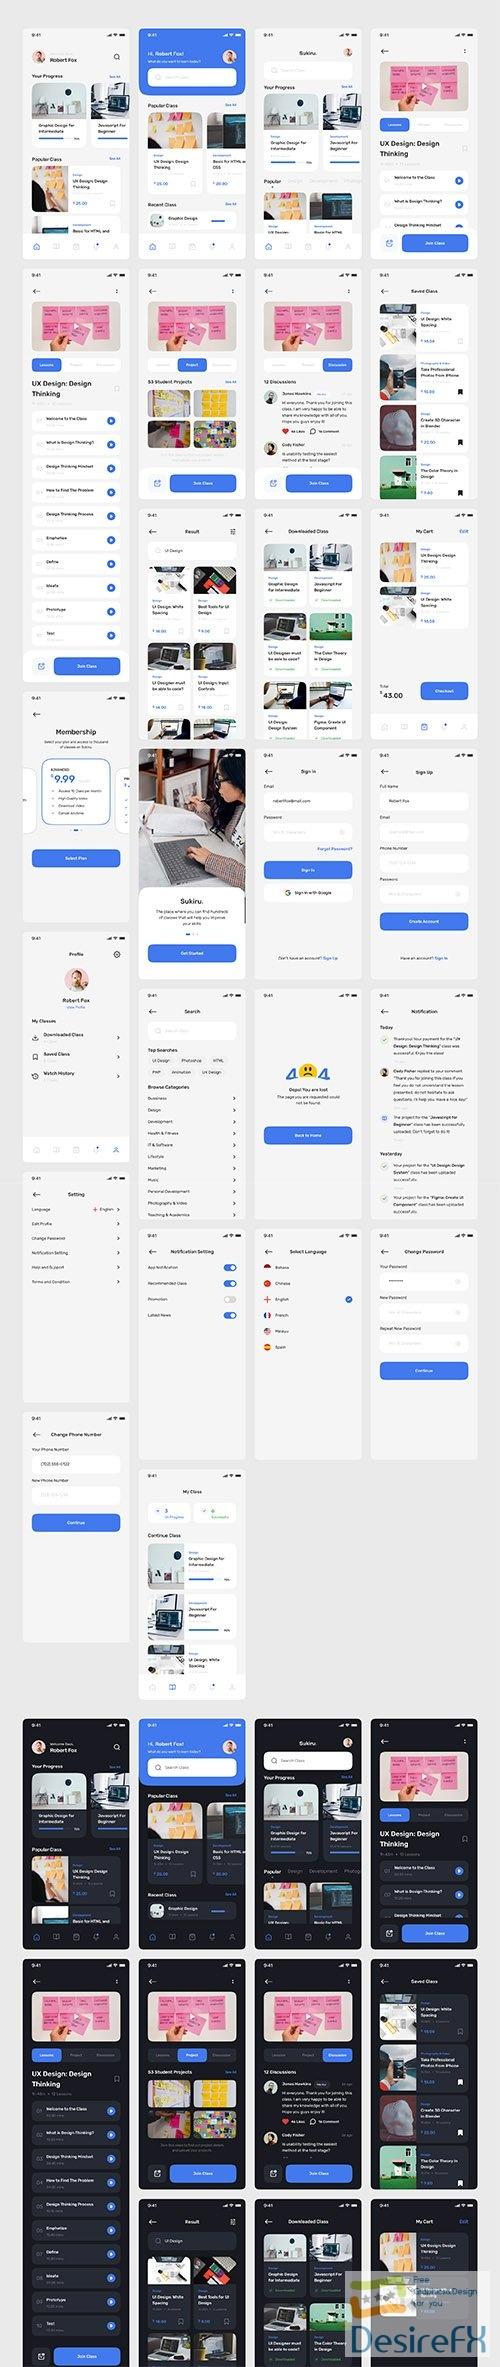 Sikiru - E-Course App UI Kit - UI8